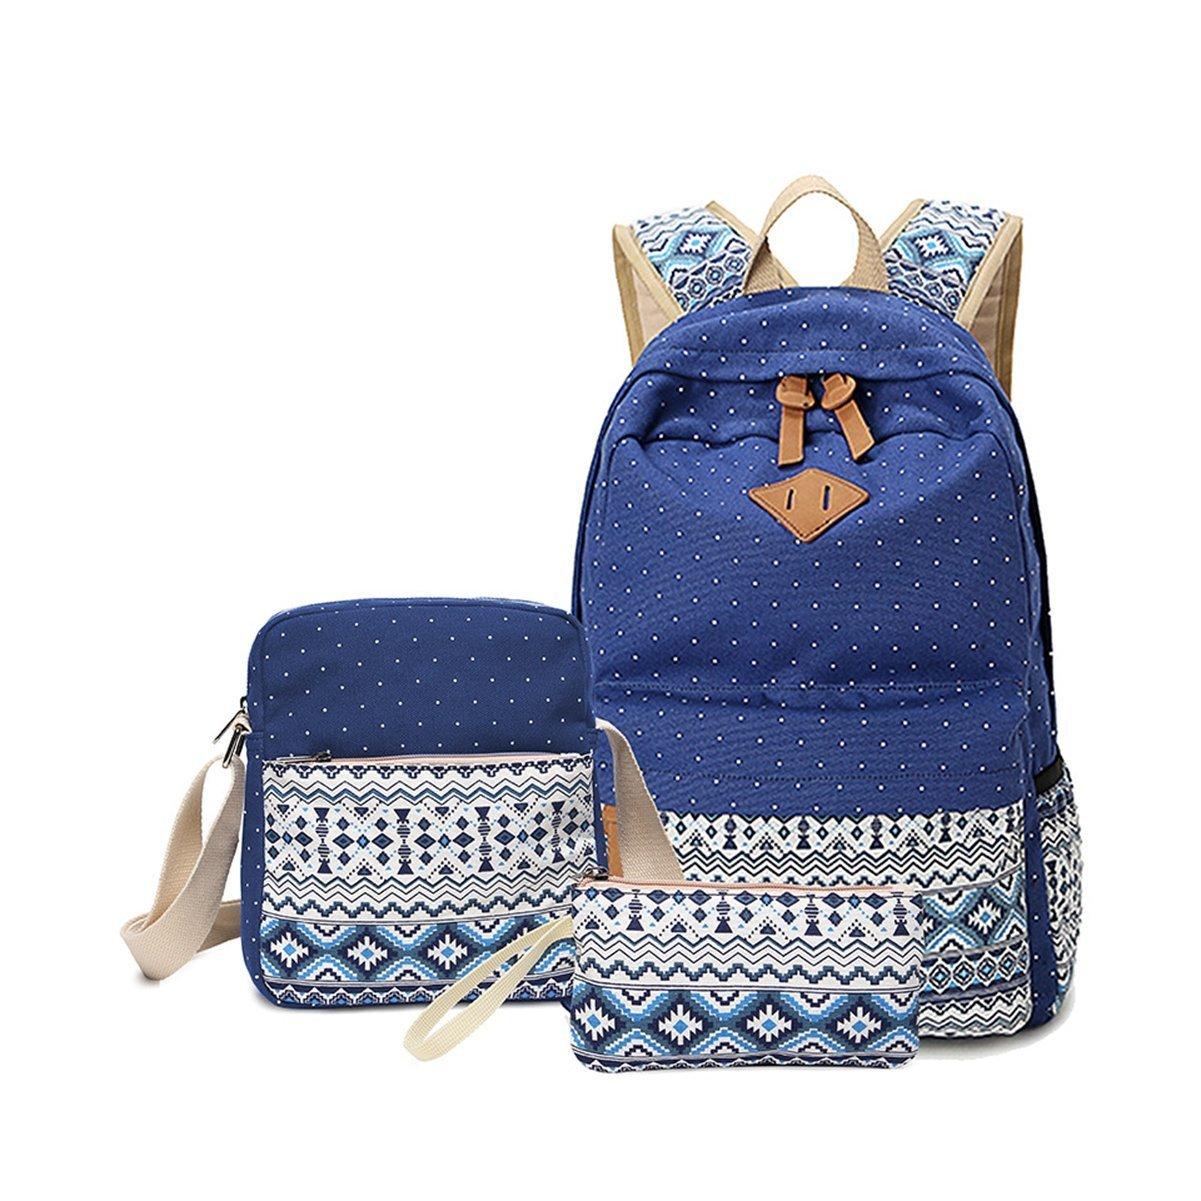 b4db34b88a Amazon.com  Cheneypao Canvas Bookbag Casual School Backpack Cute Schoolbag  Laptop Book Bag Set 3 Pieces for Teen Girls Boys (Blue)  Clothing